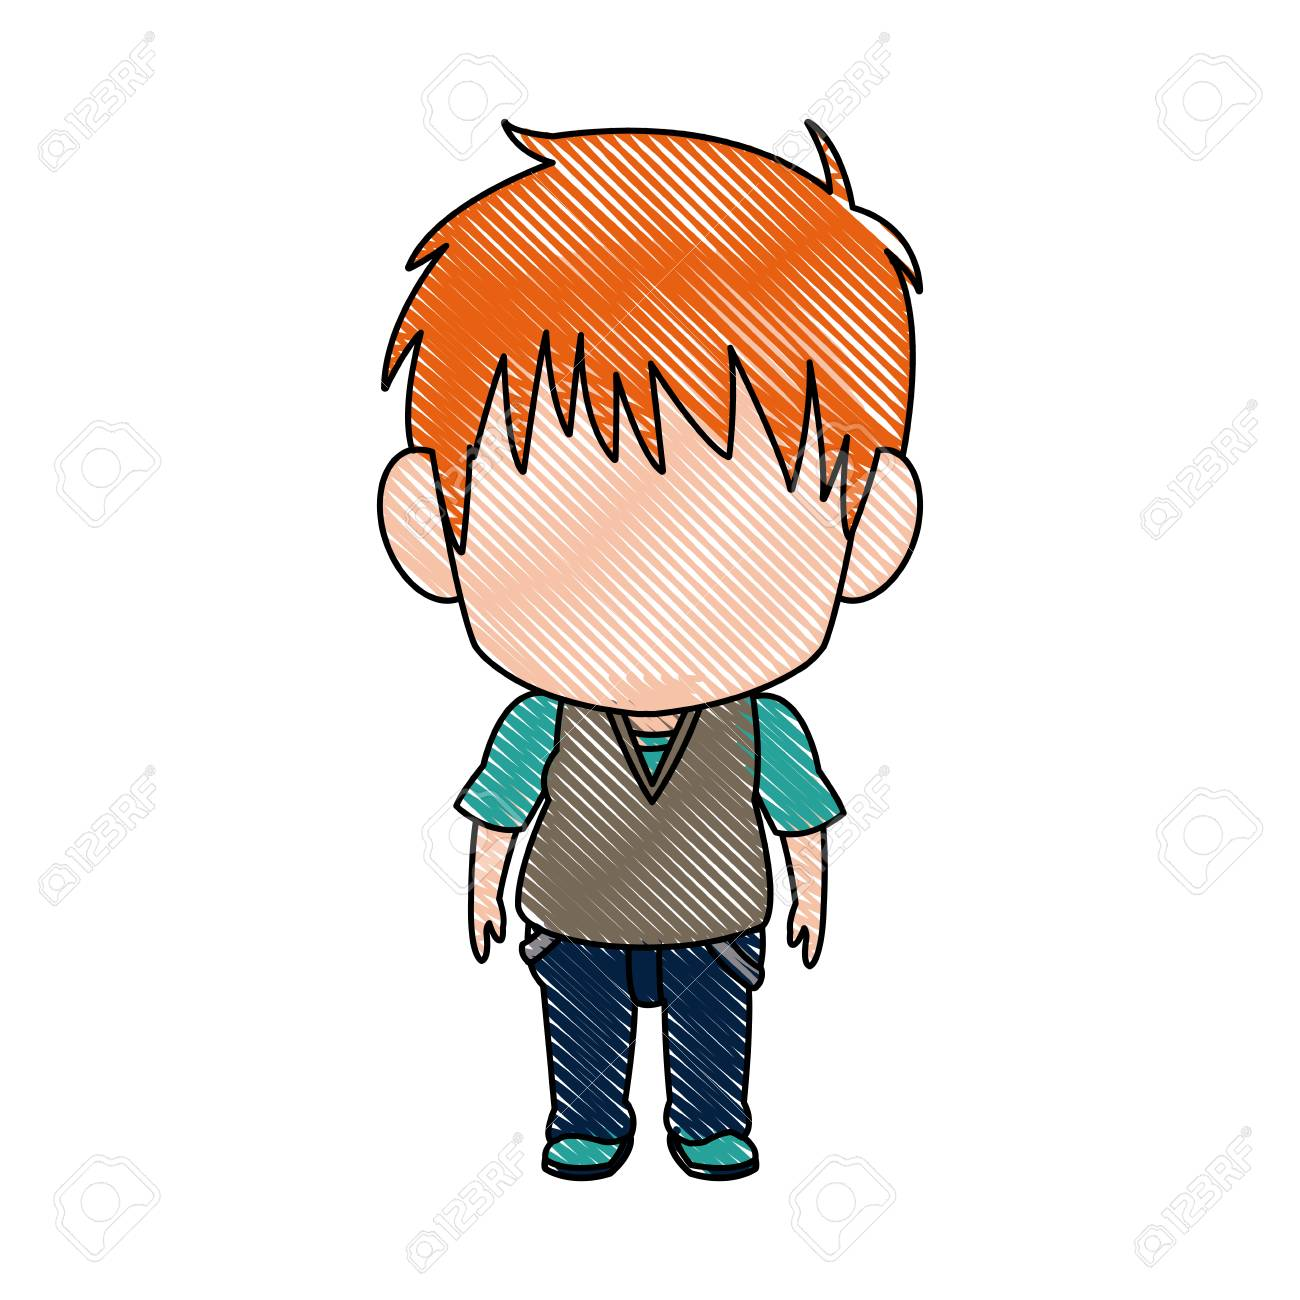 Cute little boy anime faceless color image vector illustration stock vector 80034502